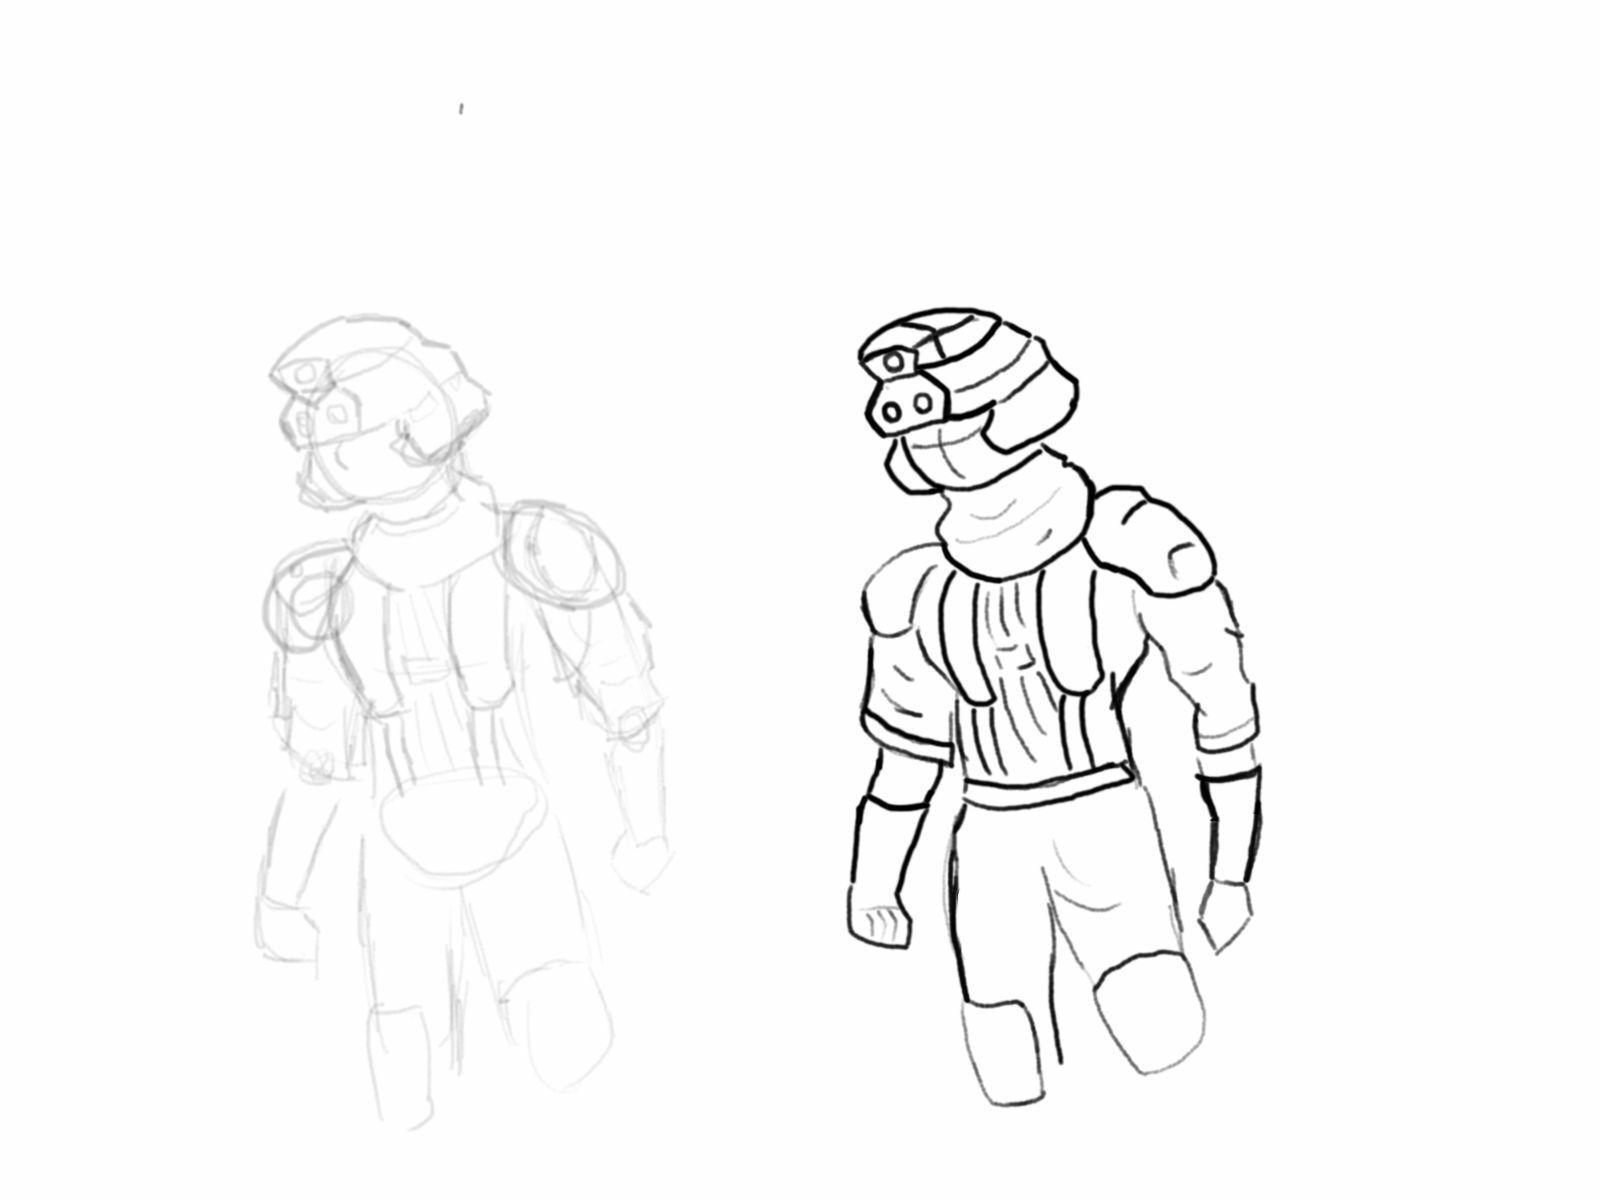 Shinra trooper